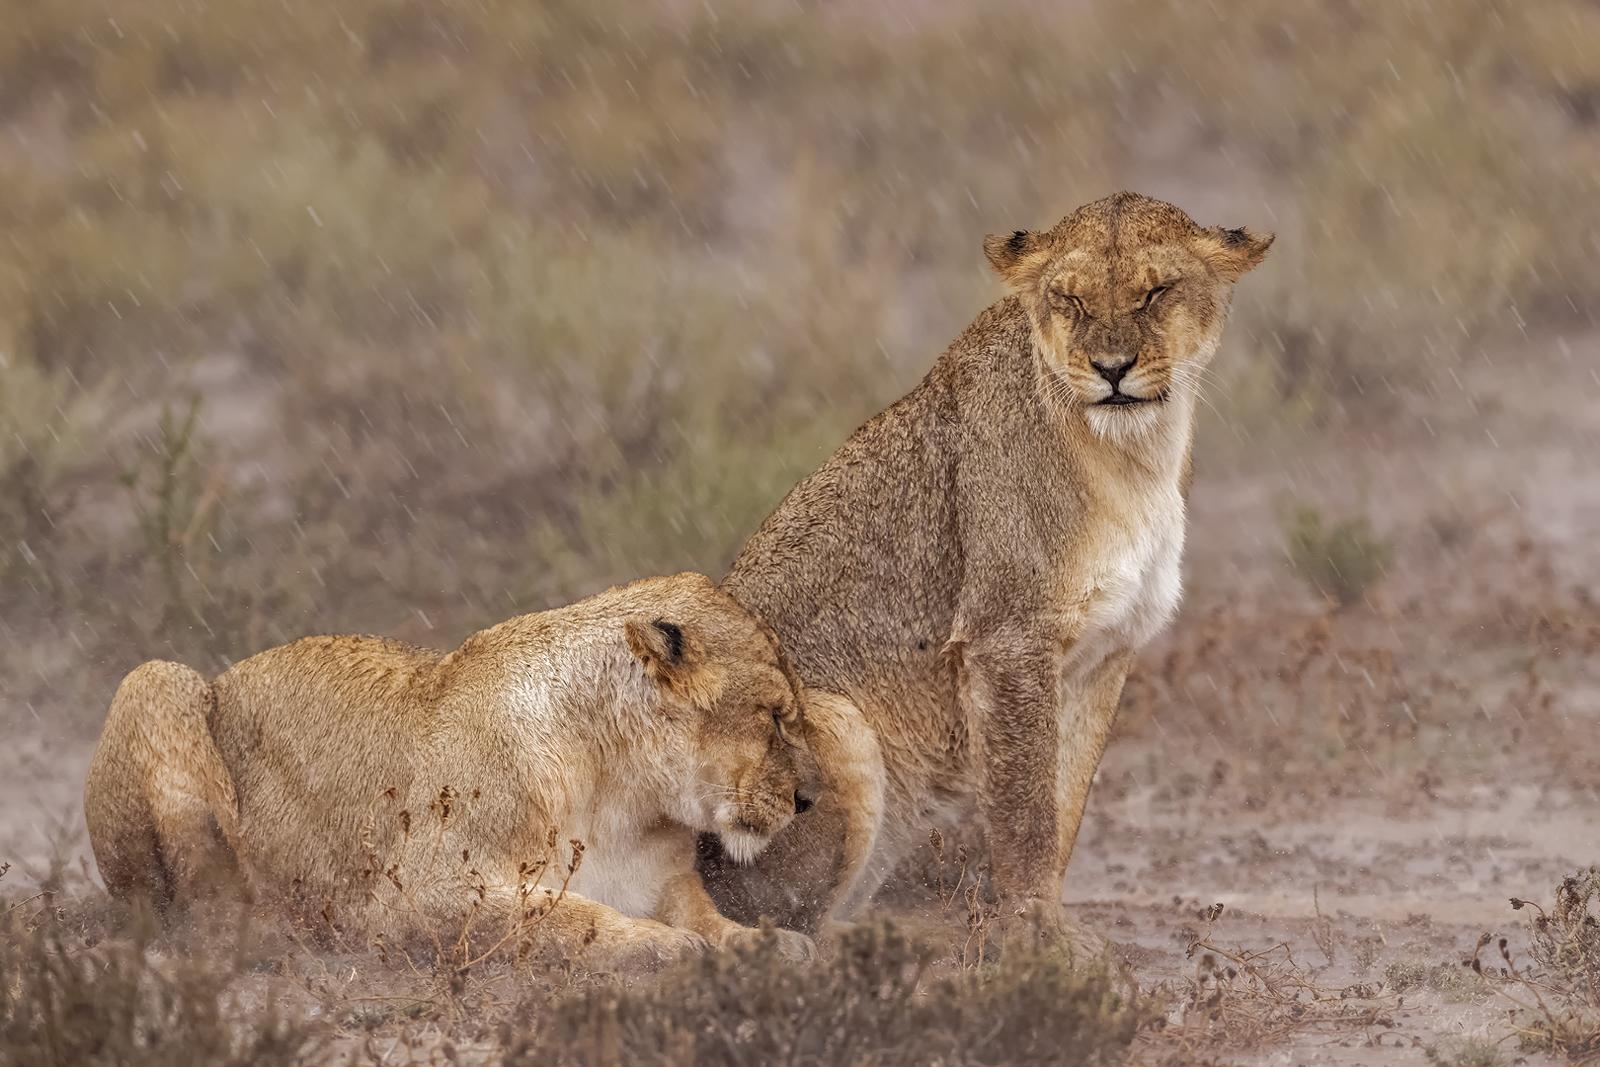 Lionesses sitting in the rain in Kgalagadi Transfrontier Park